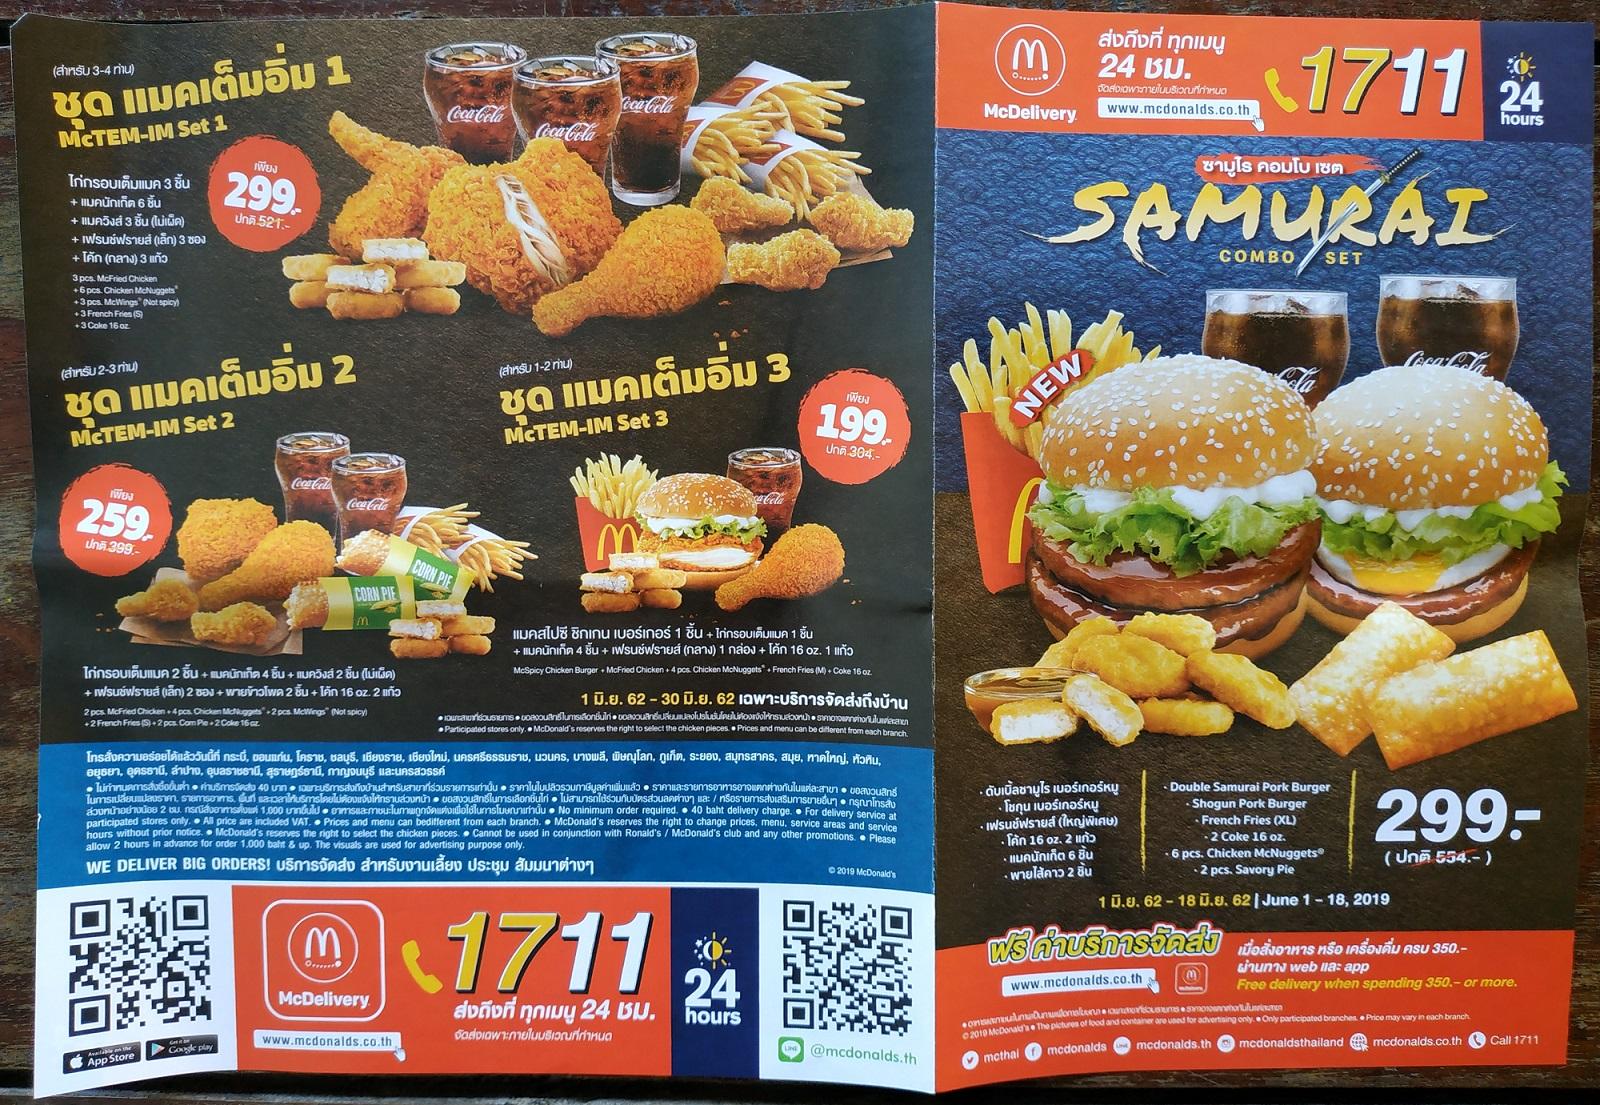 McDonalds Delivery Service menu in Thailand 1711